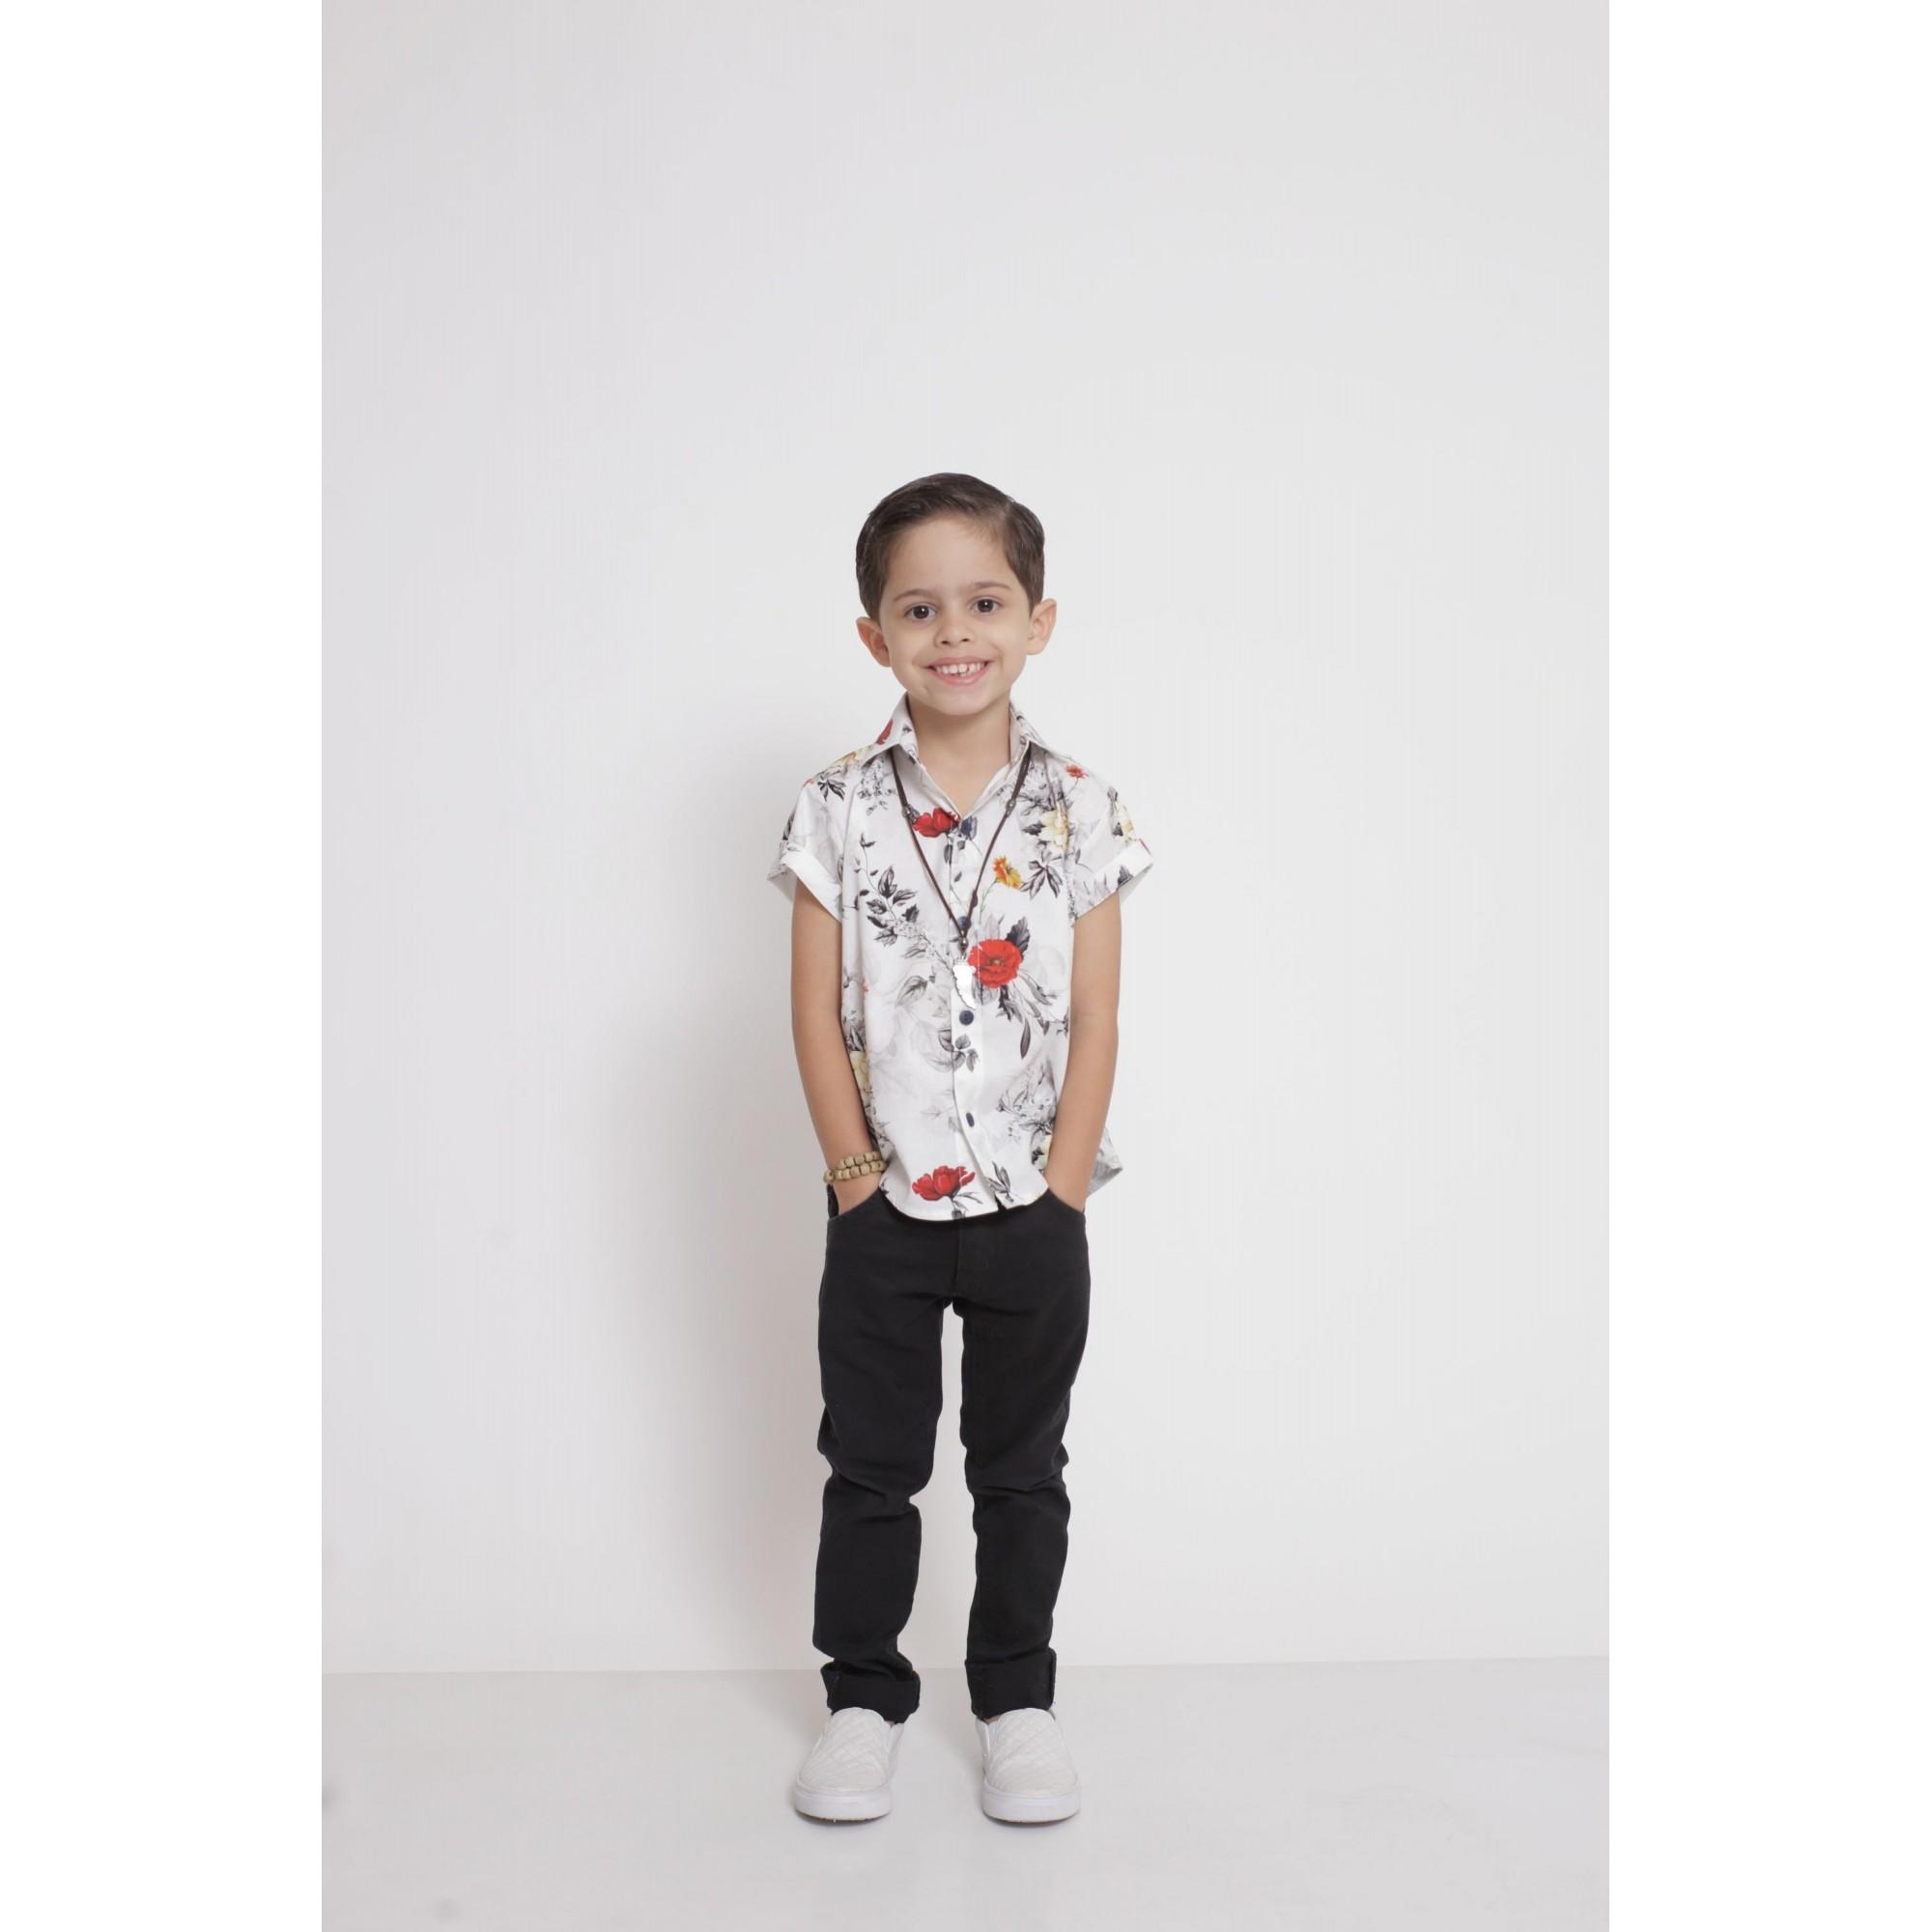 Camisa Social Manga Curta Branca Floral Infantil  - Heitor Fashion Brazil